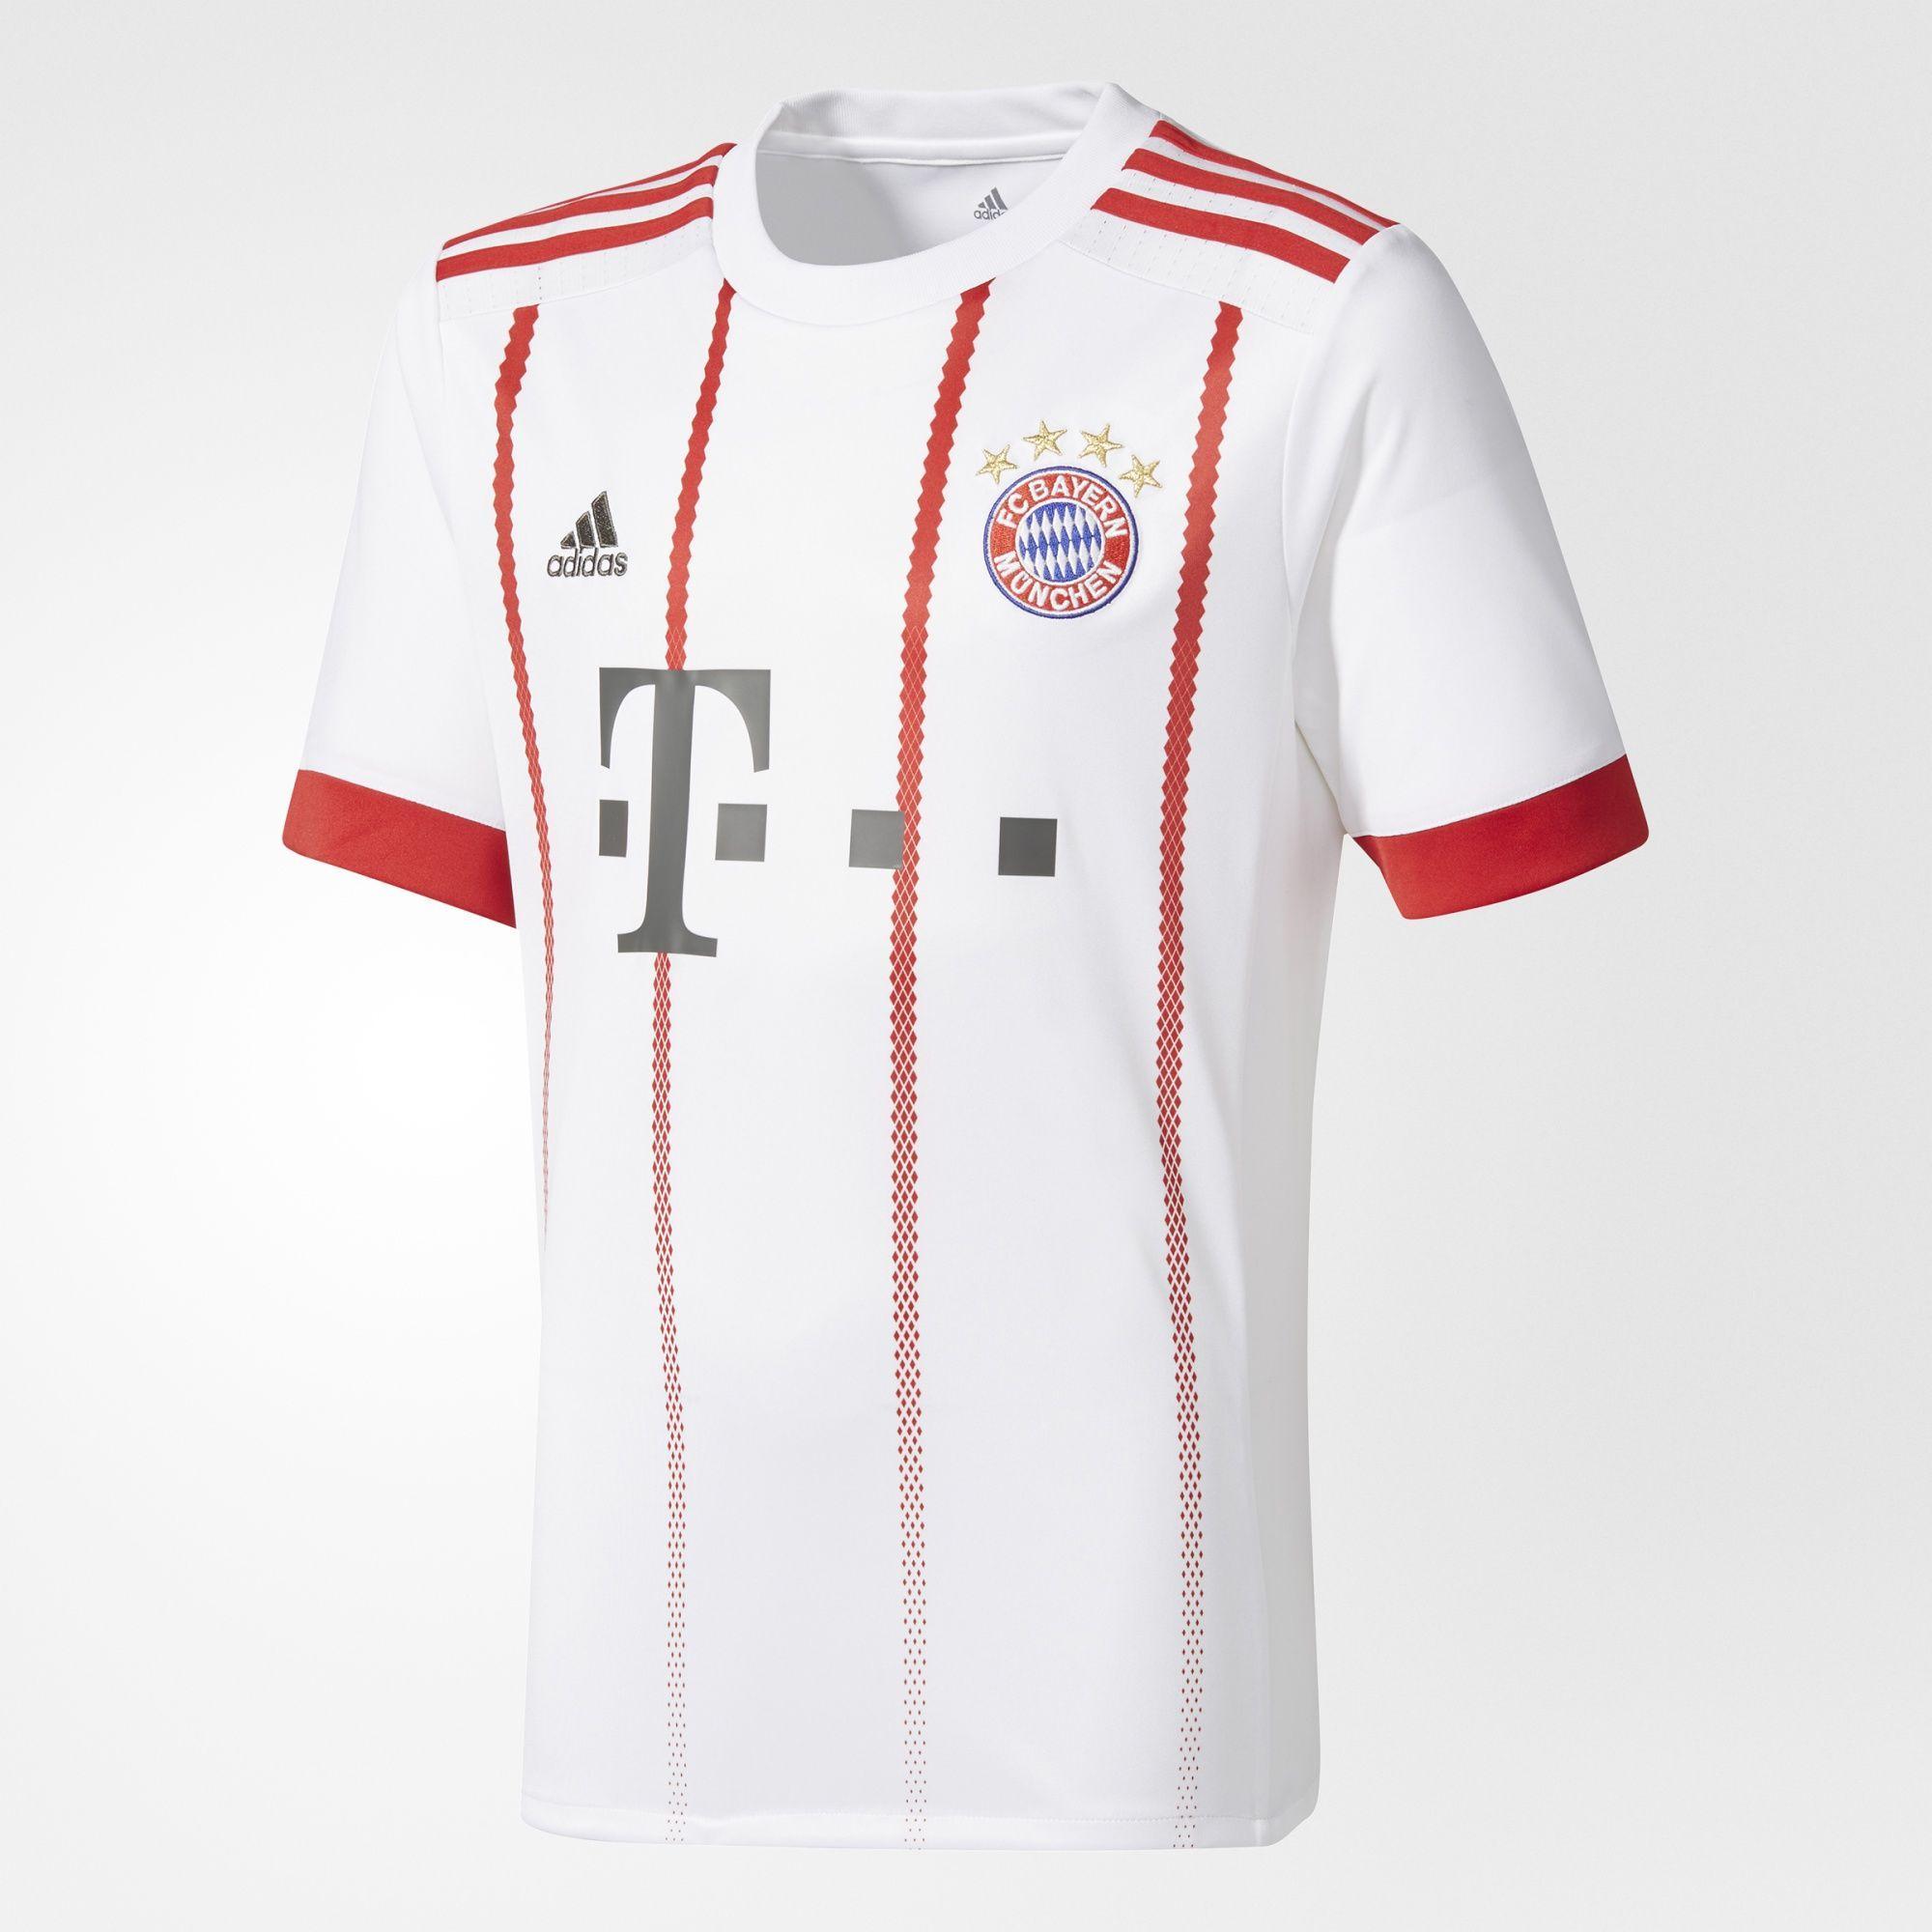 Kinder FC Bayern Munich UCL Replica Jersey